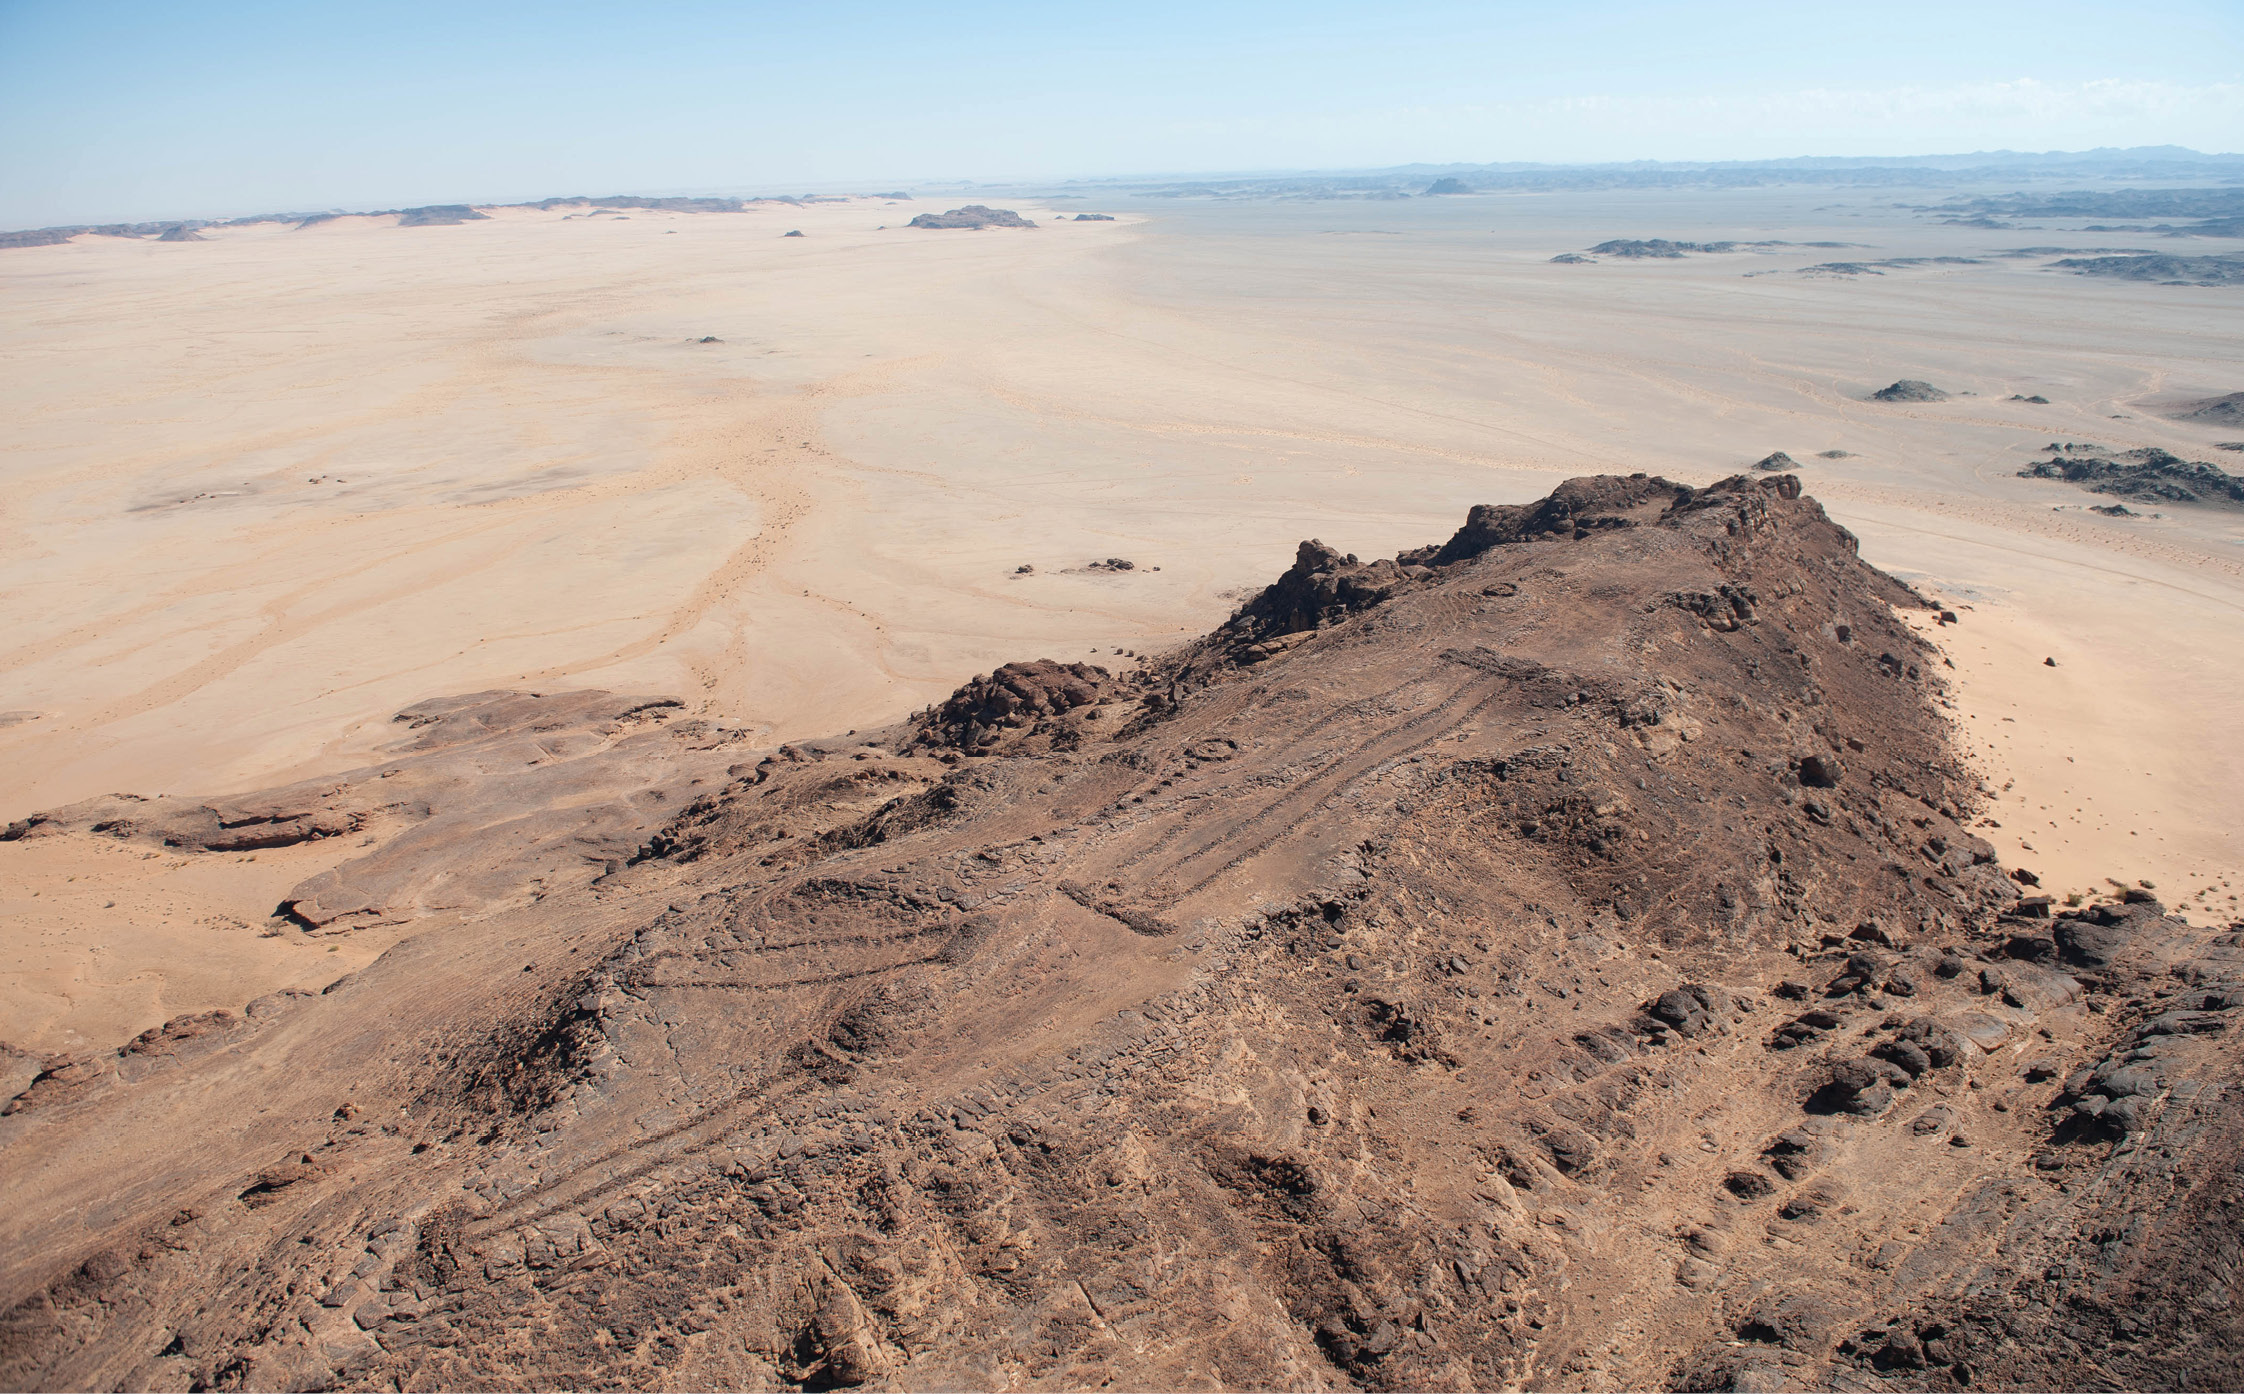 Arabia's monumental landscape